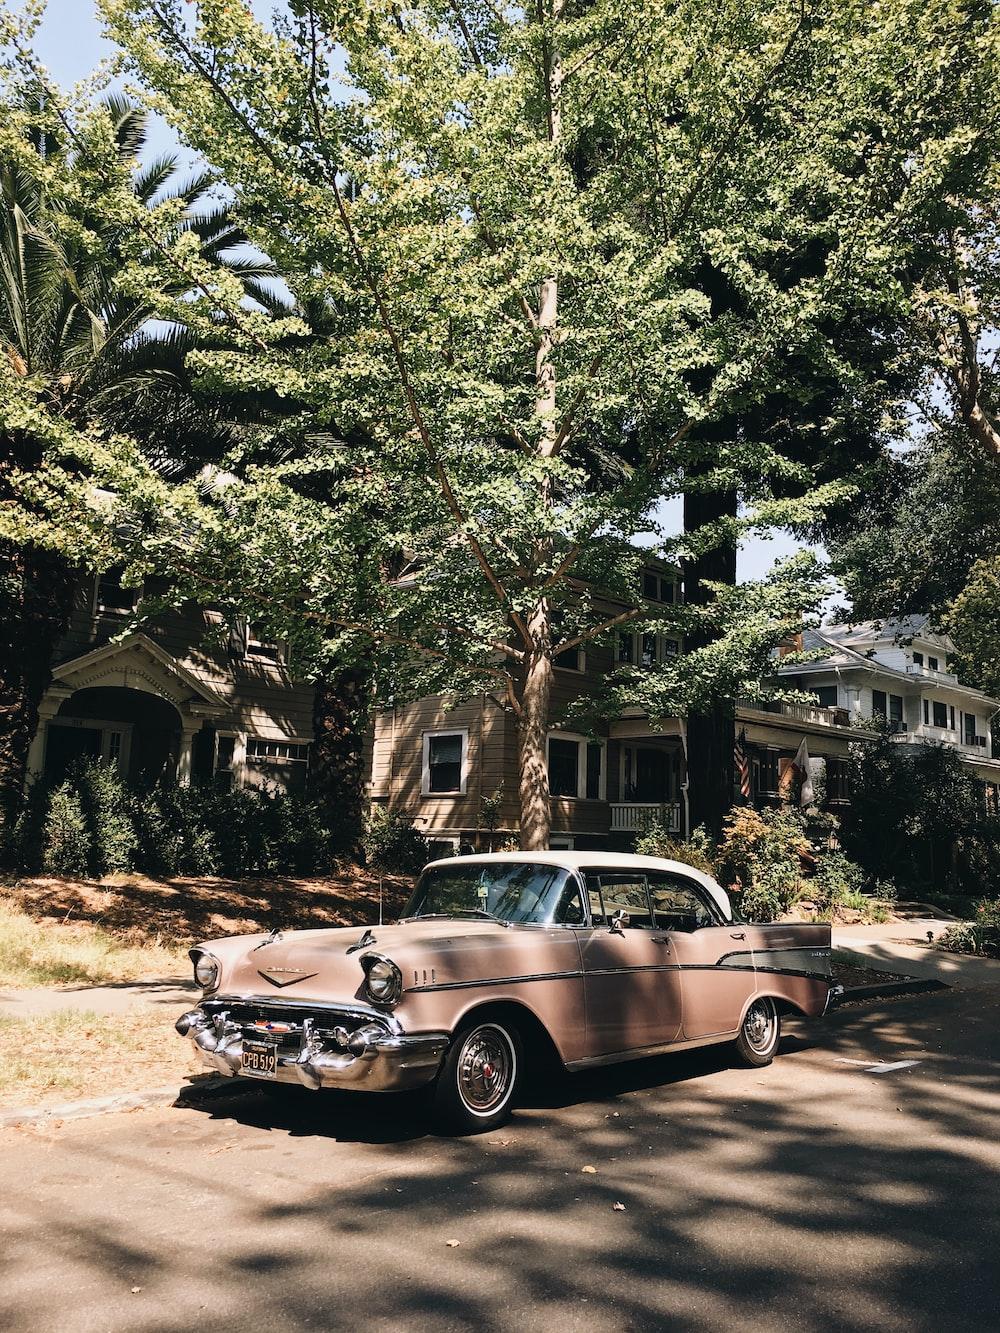 vintage pink sedan parked in front of tree